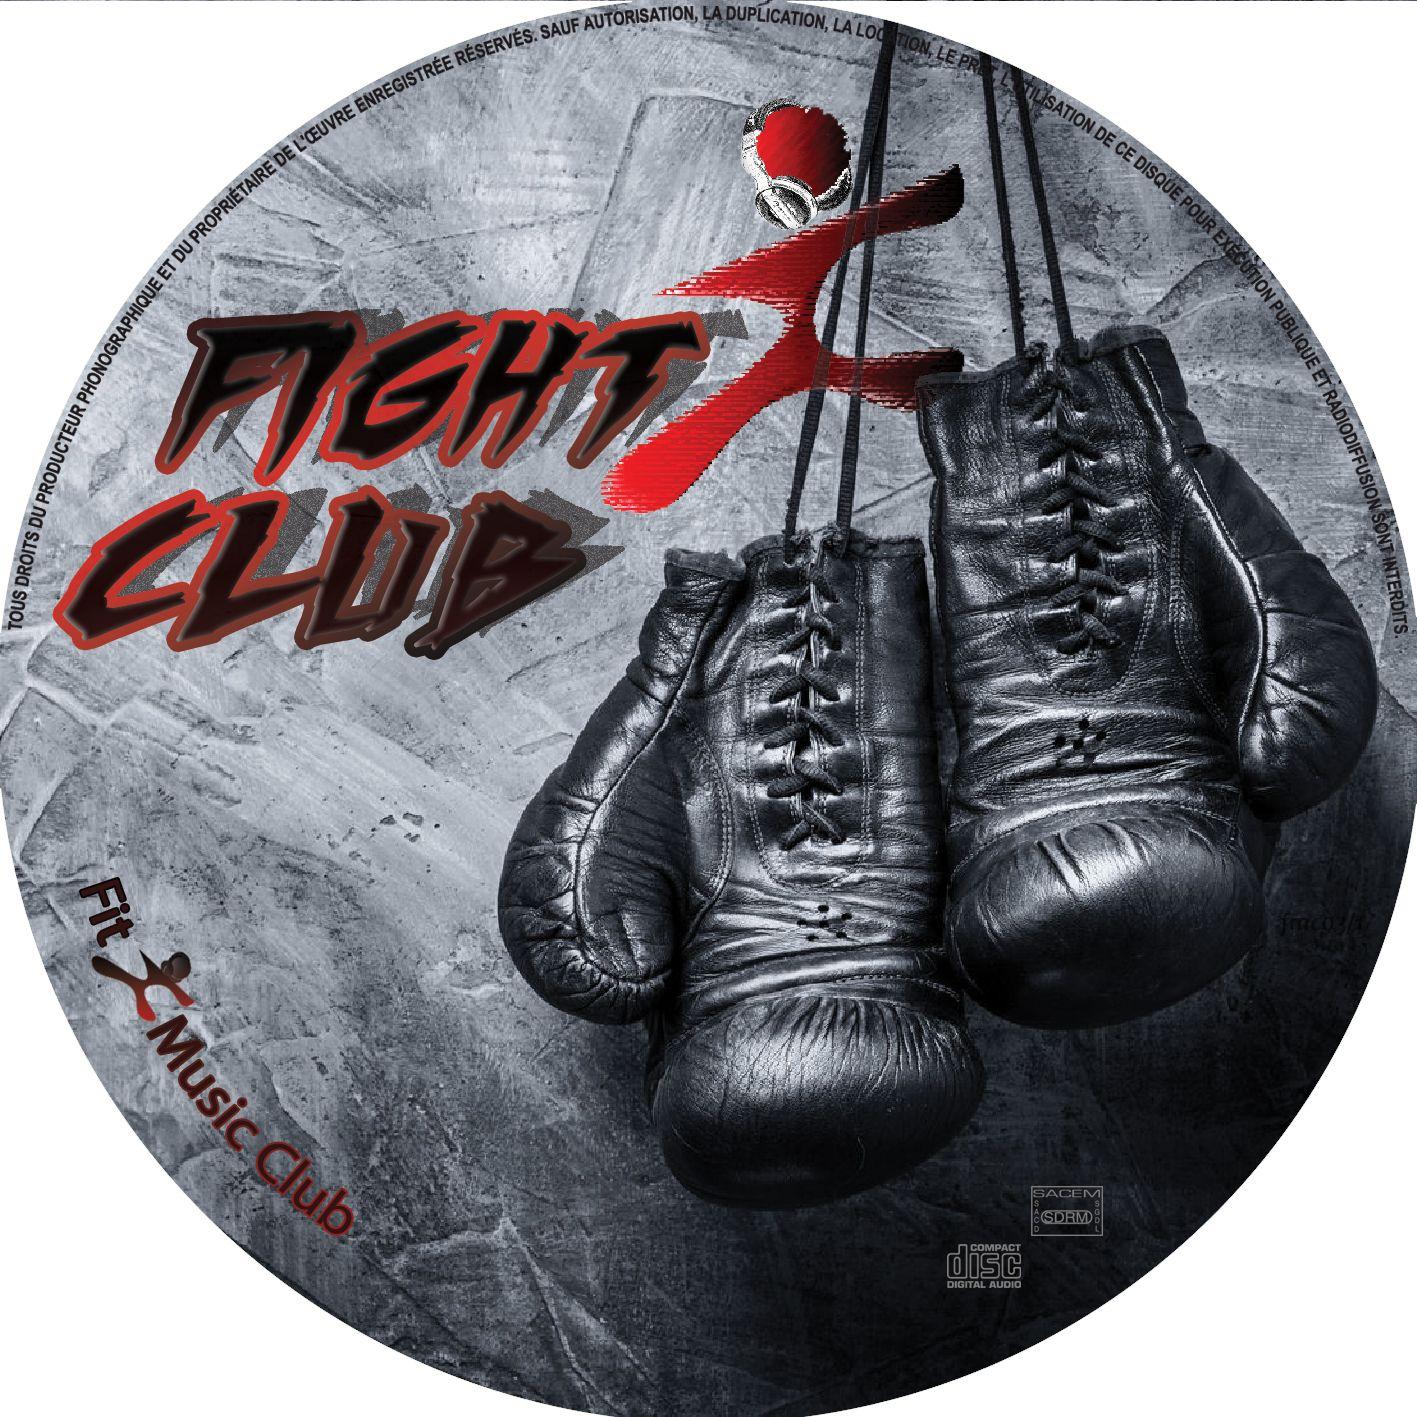 CD fightclub site